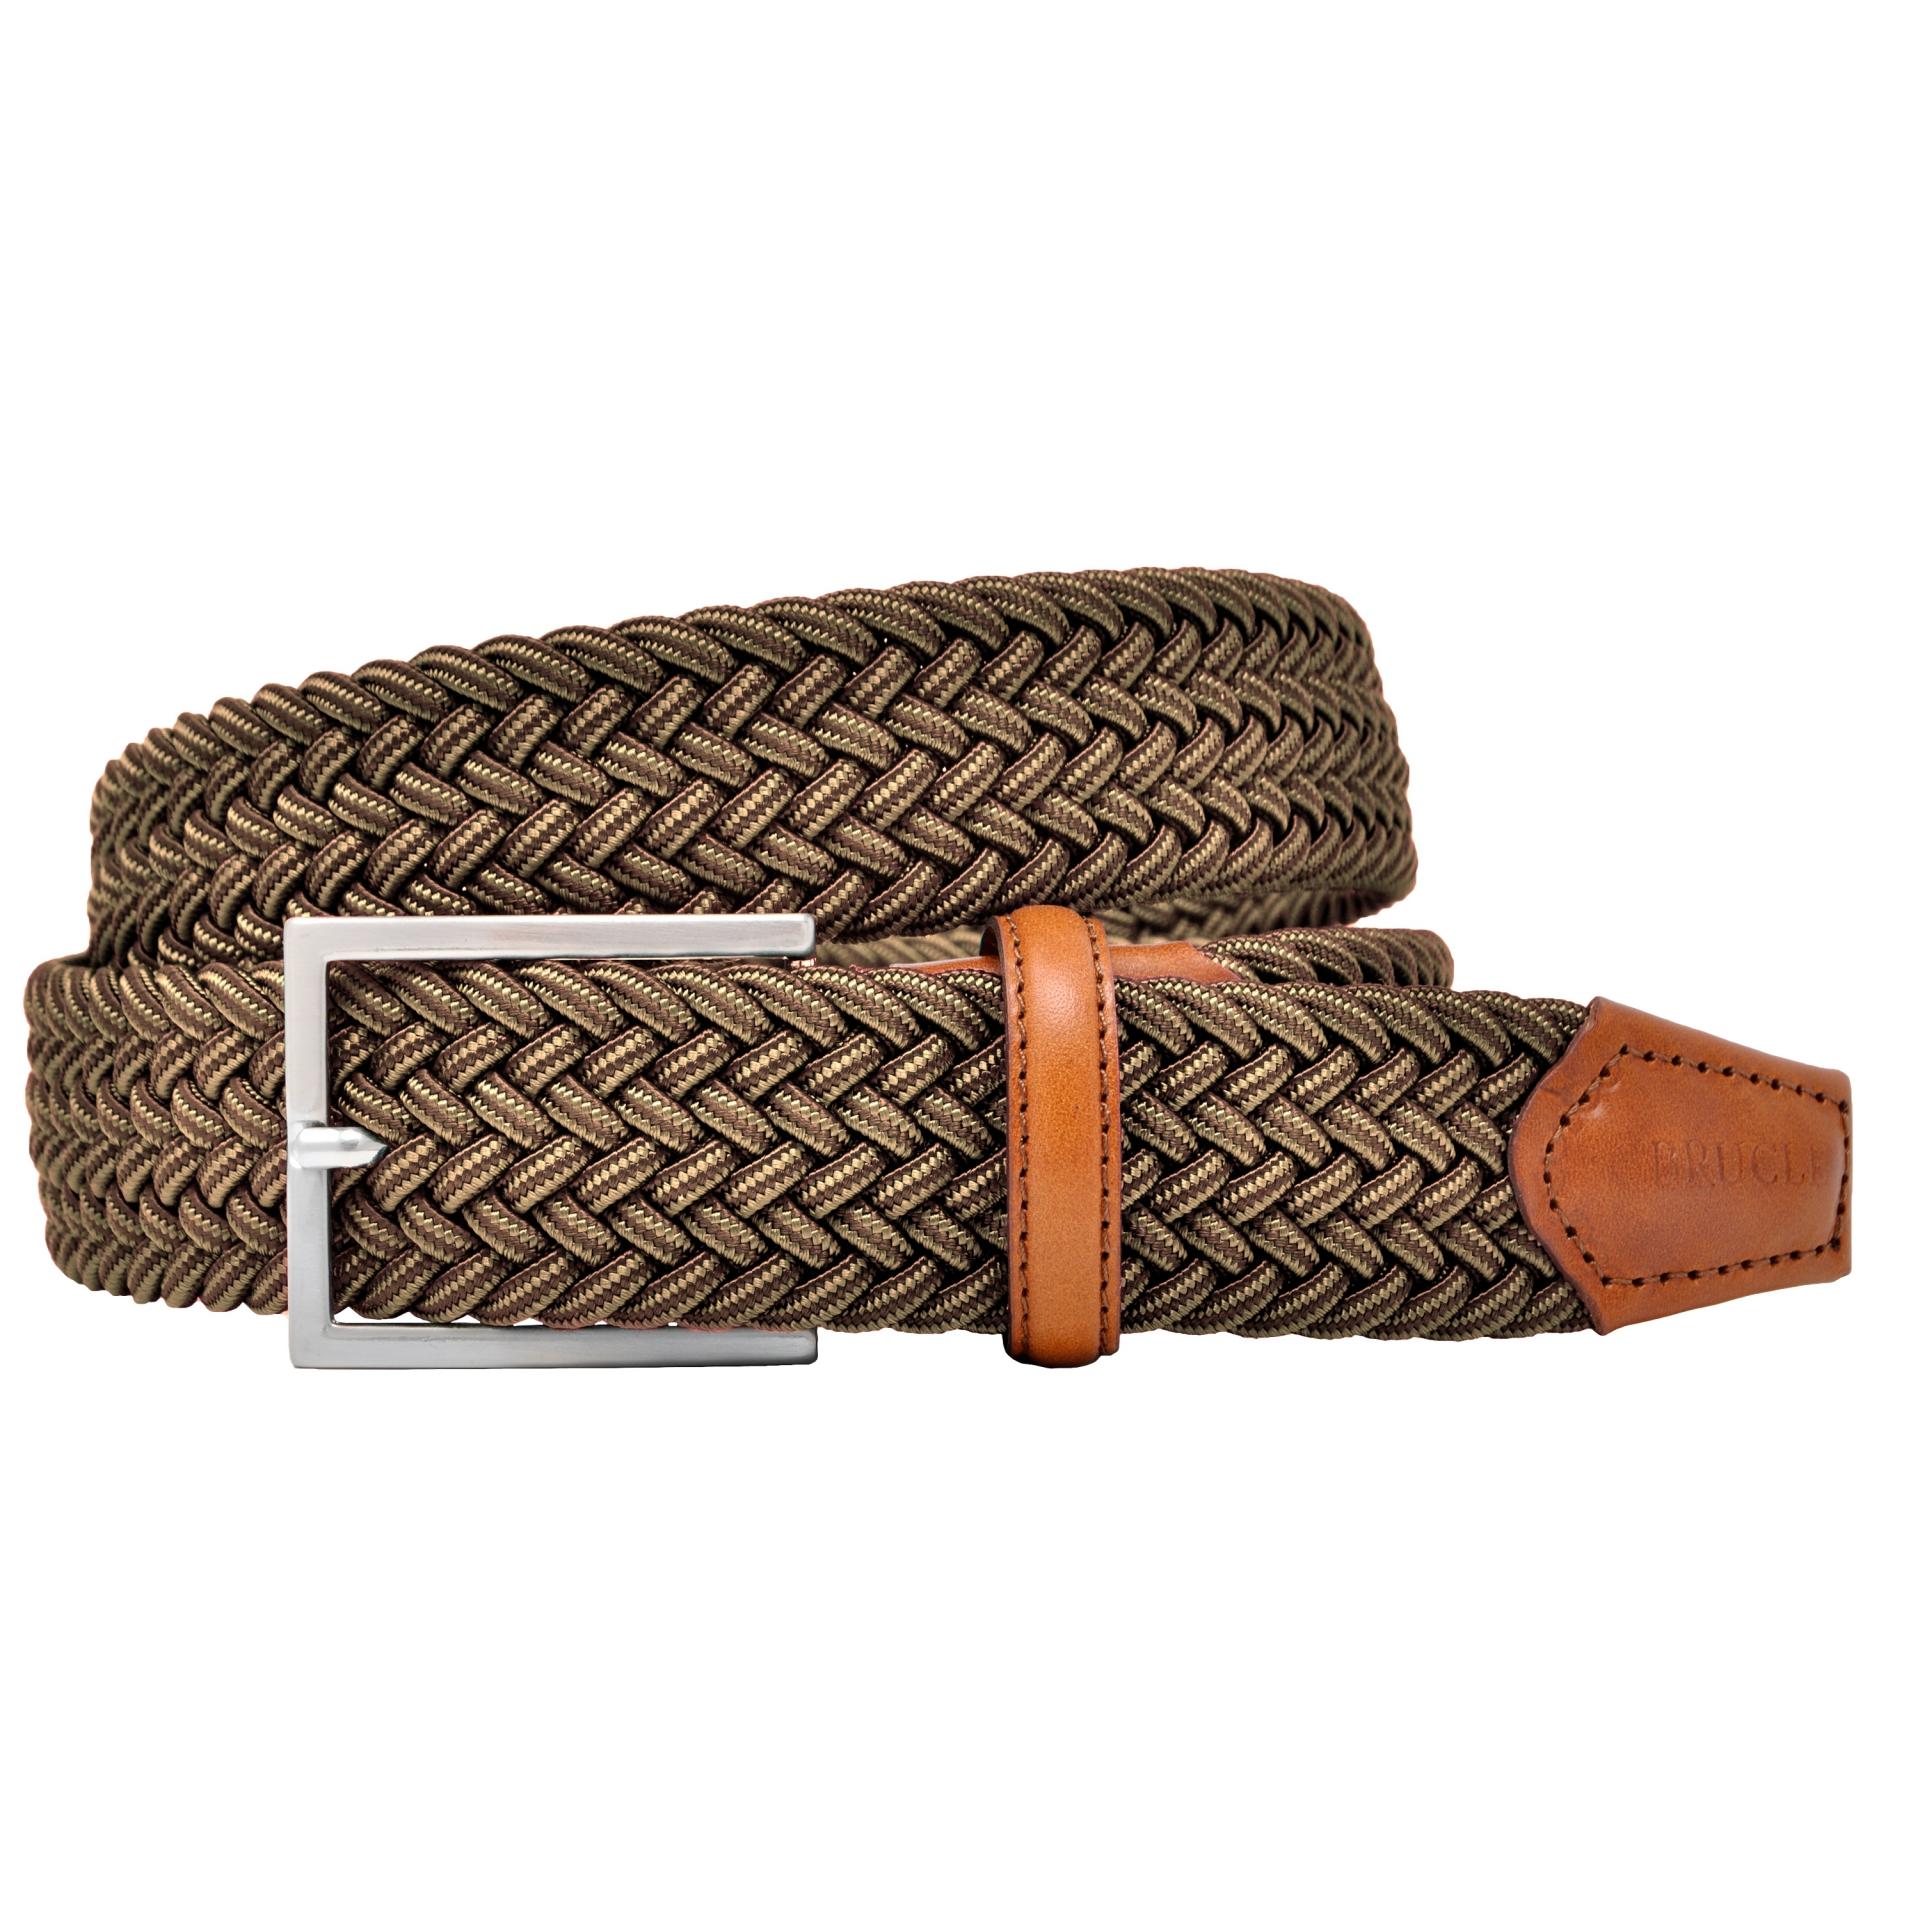 Braided elastic stretch belt beige brown